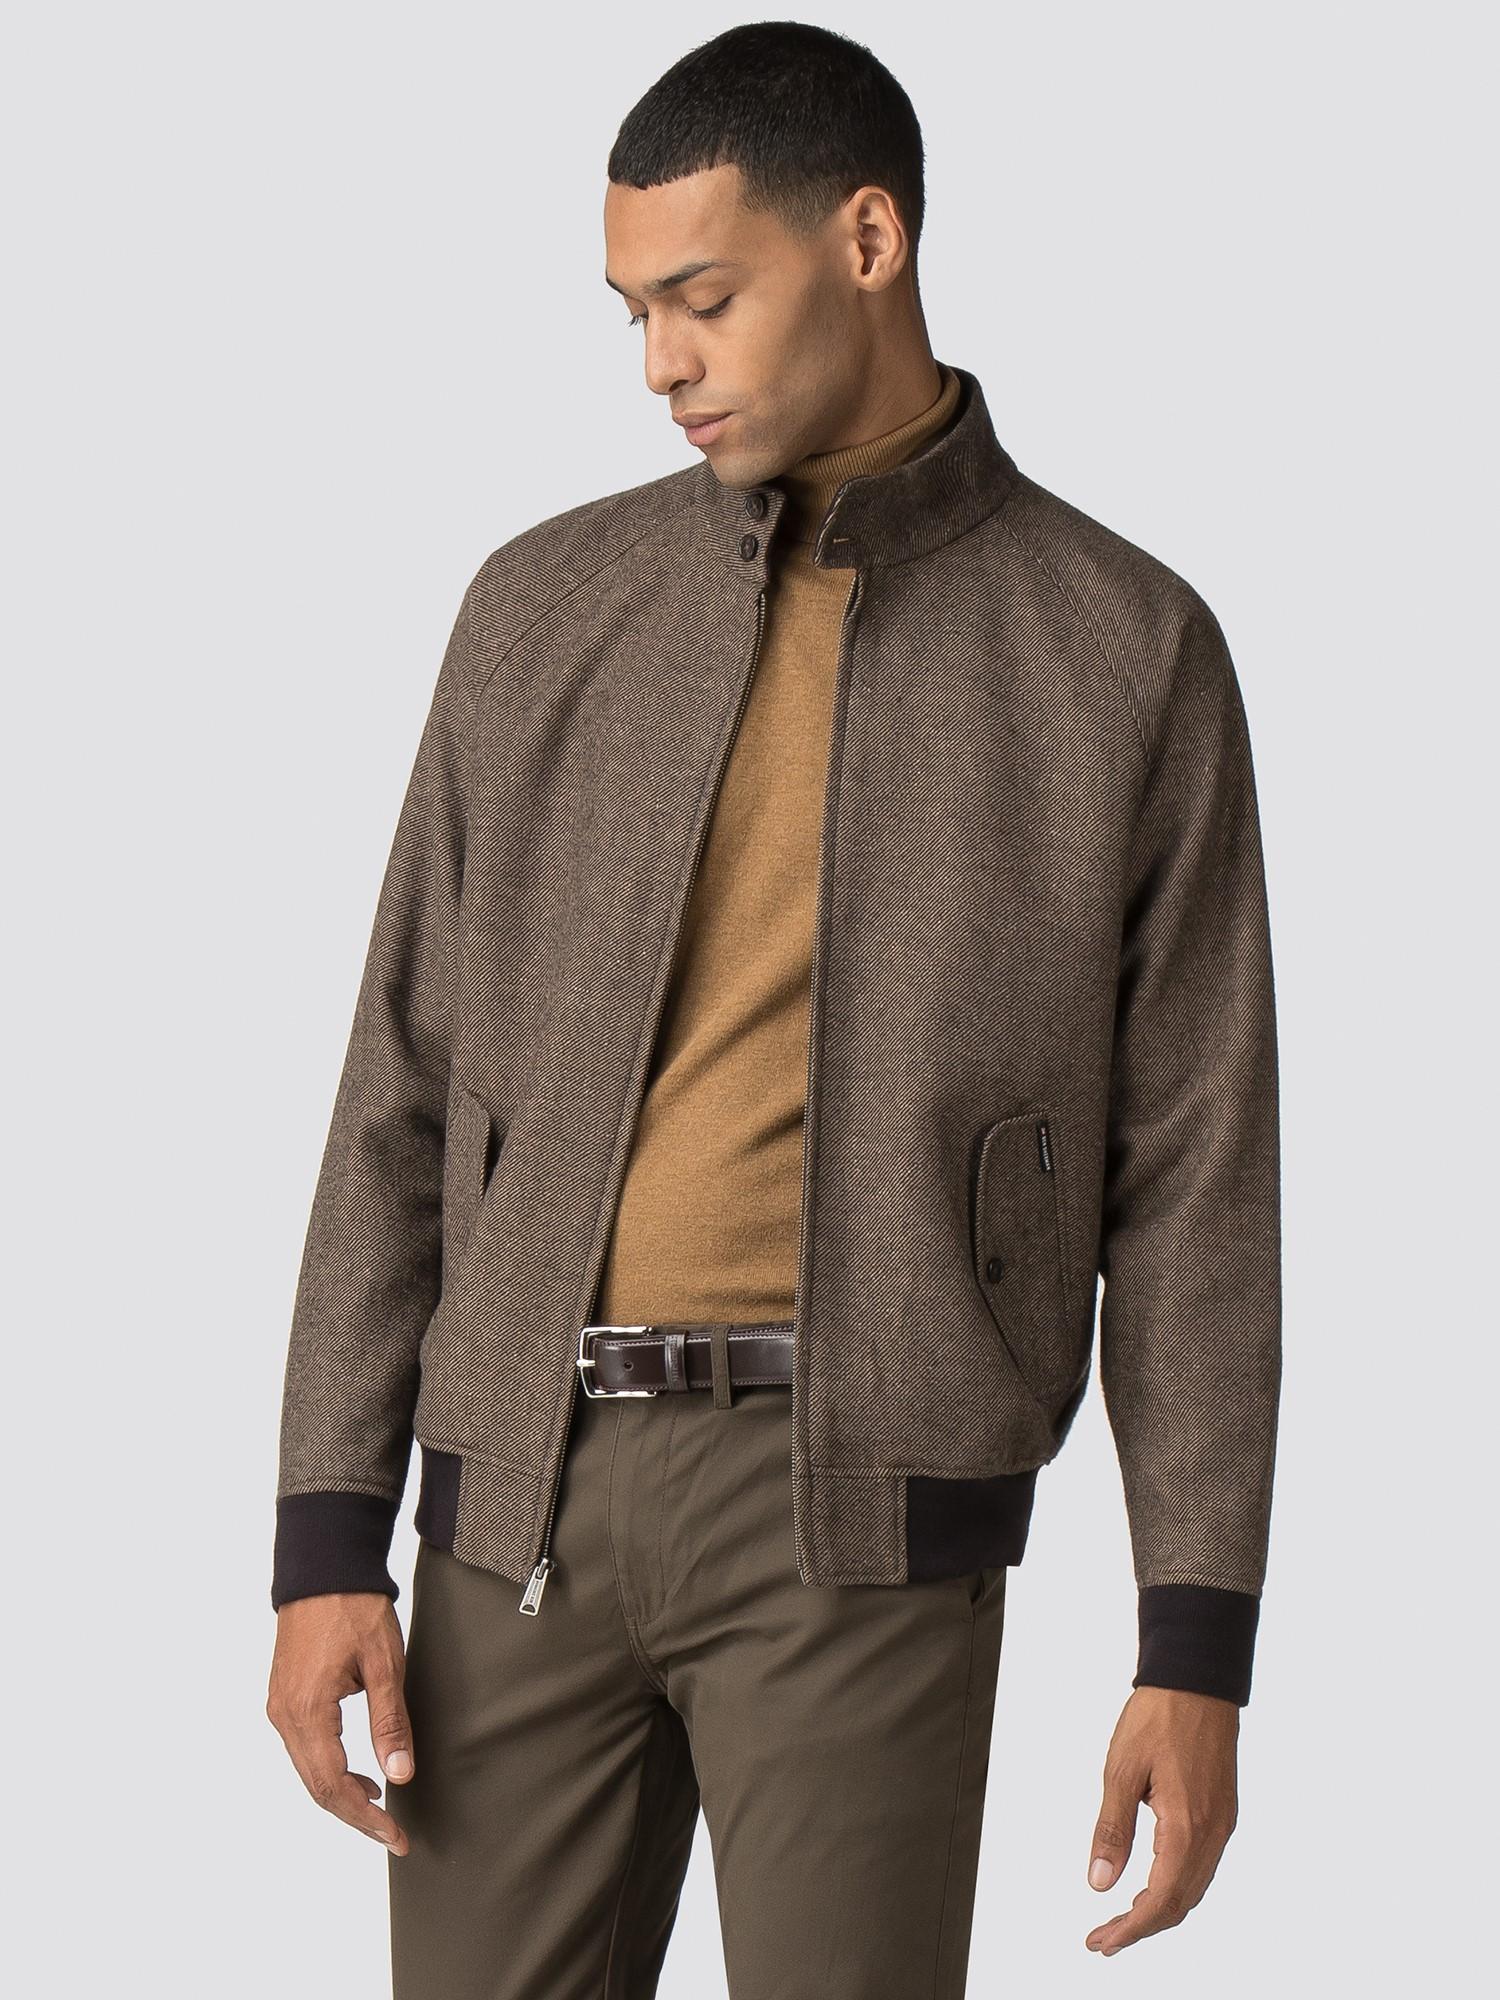 be3b268c6 Men's Brown Wool Harrington Jacket   Ben Sherman   Est 1963